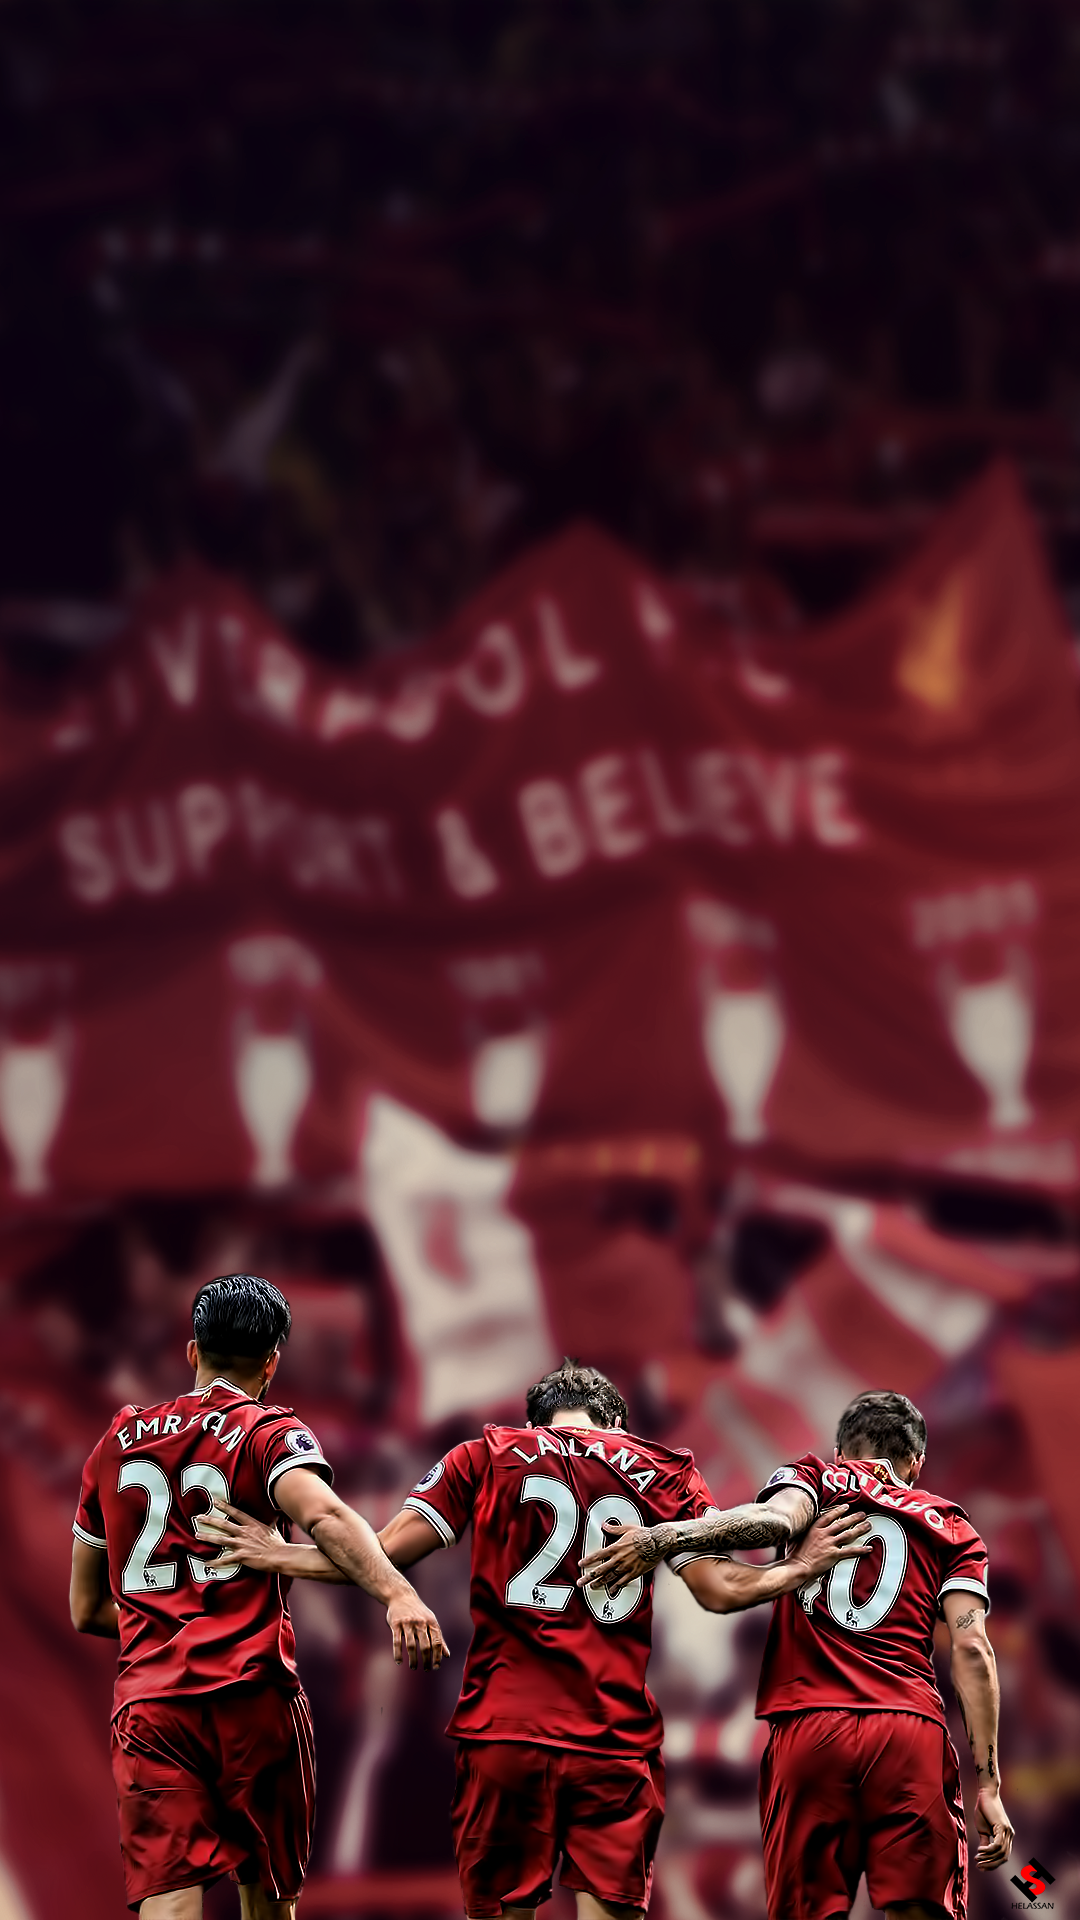 Best Liverpool Wallpaper 2019 82421 Wallpaper Download HD Wallpaper 1080x1920